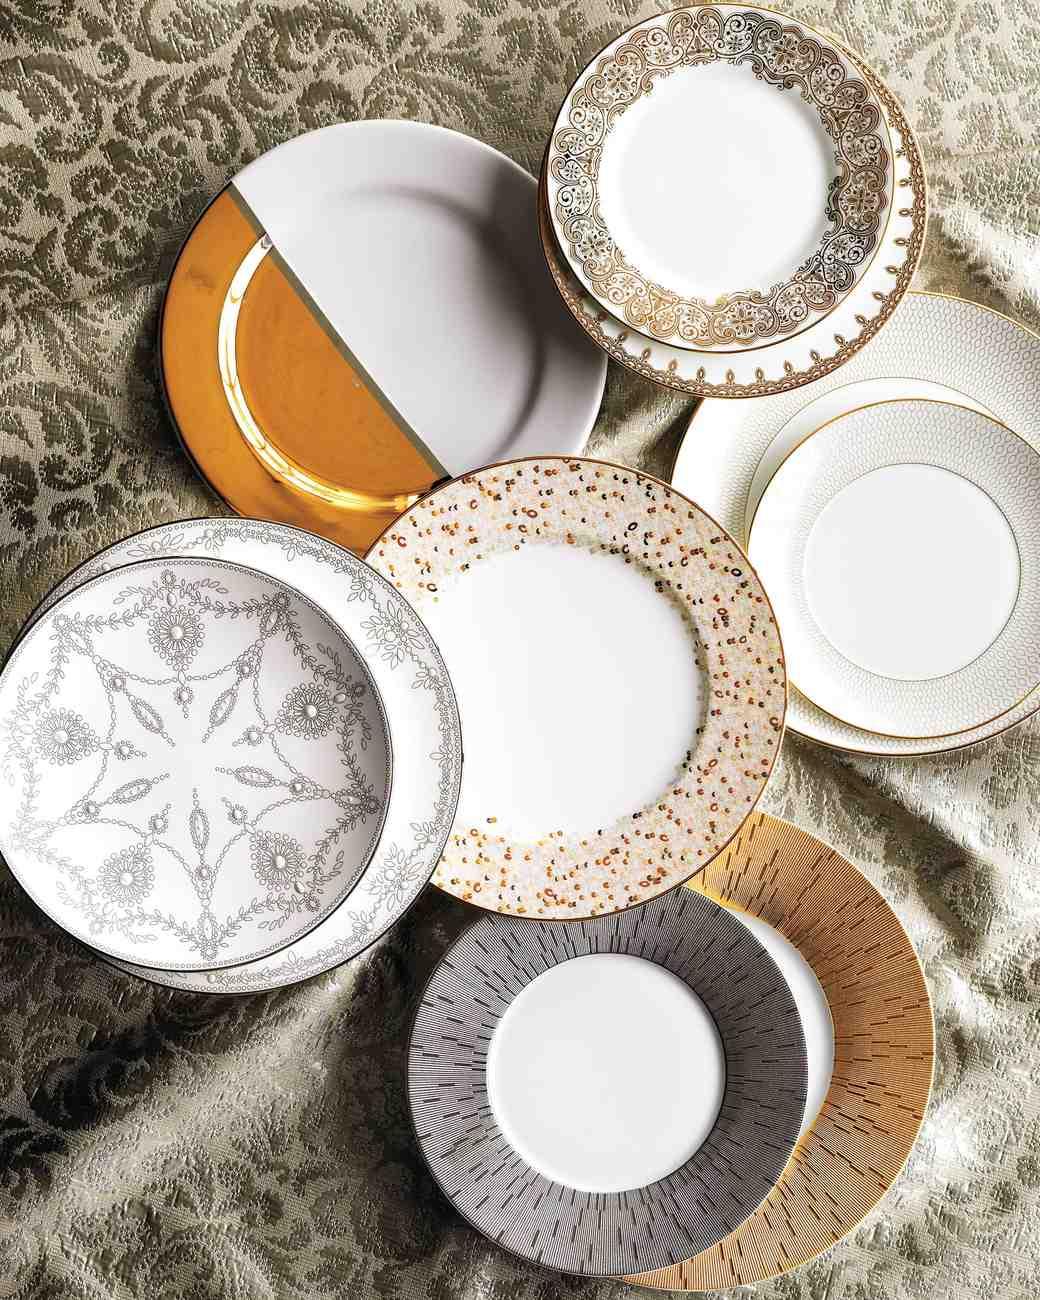 mglitter-silver-gold-plates-v2-11-d112735.jpg